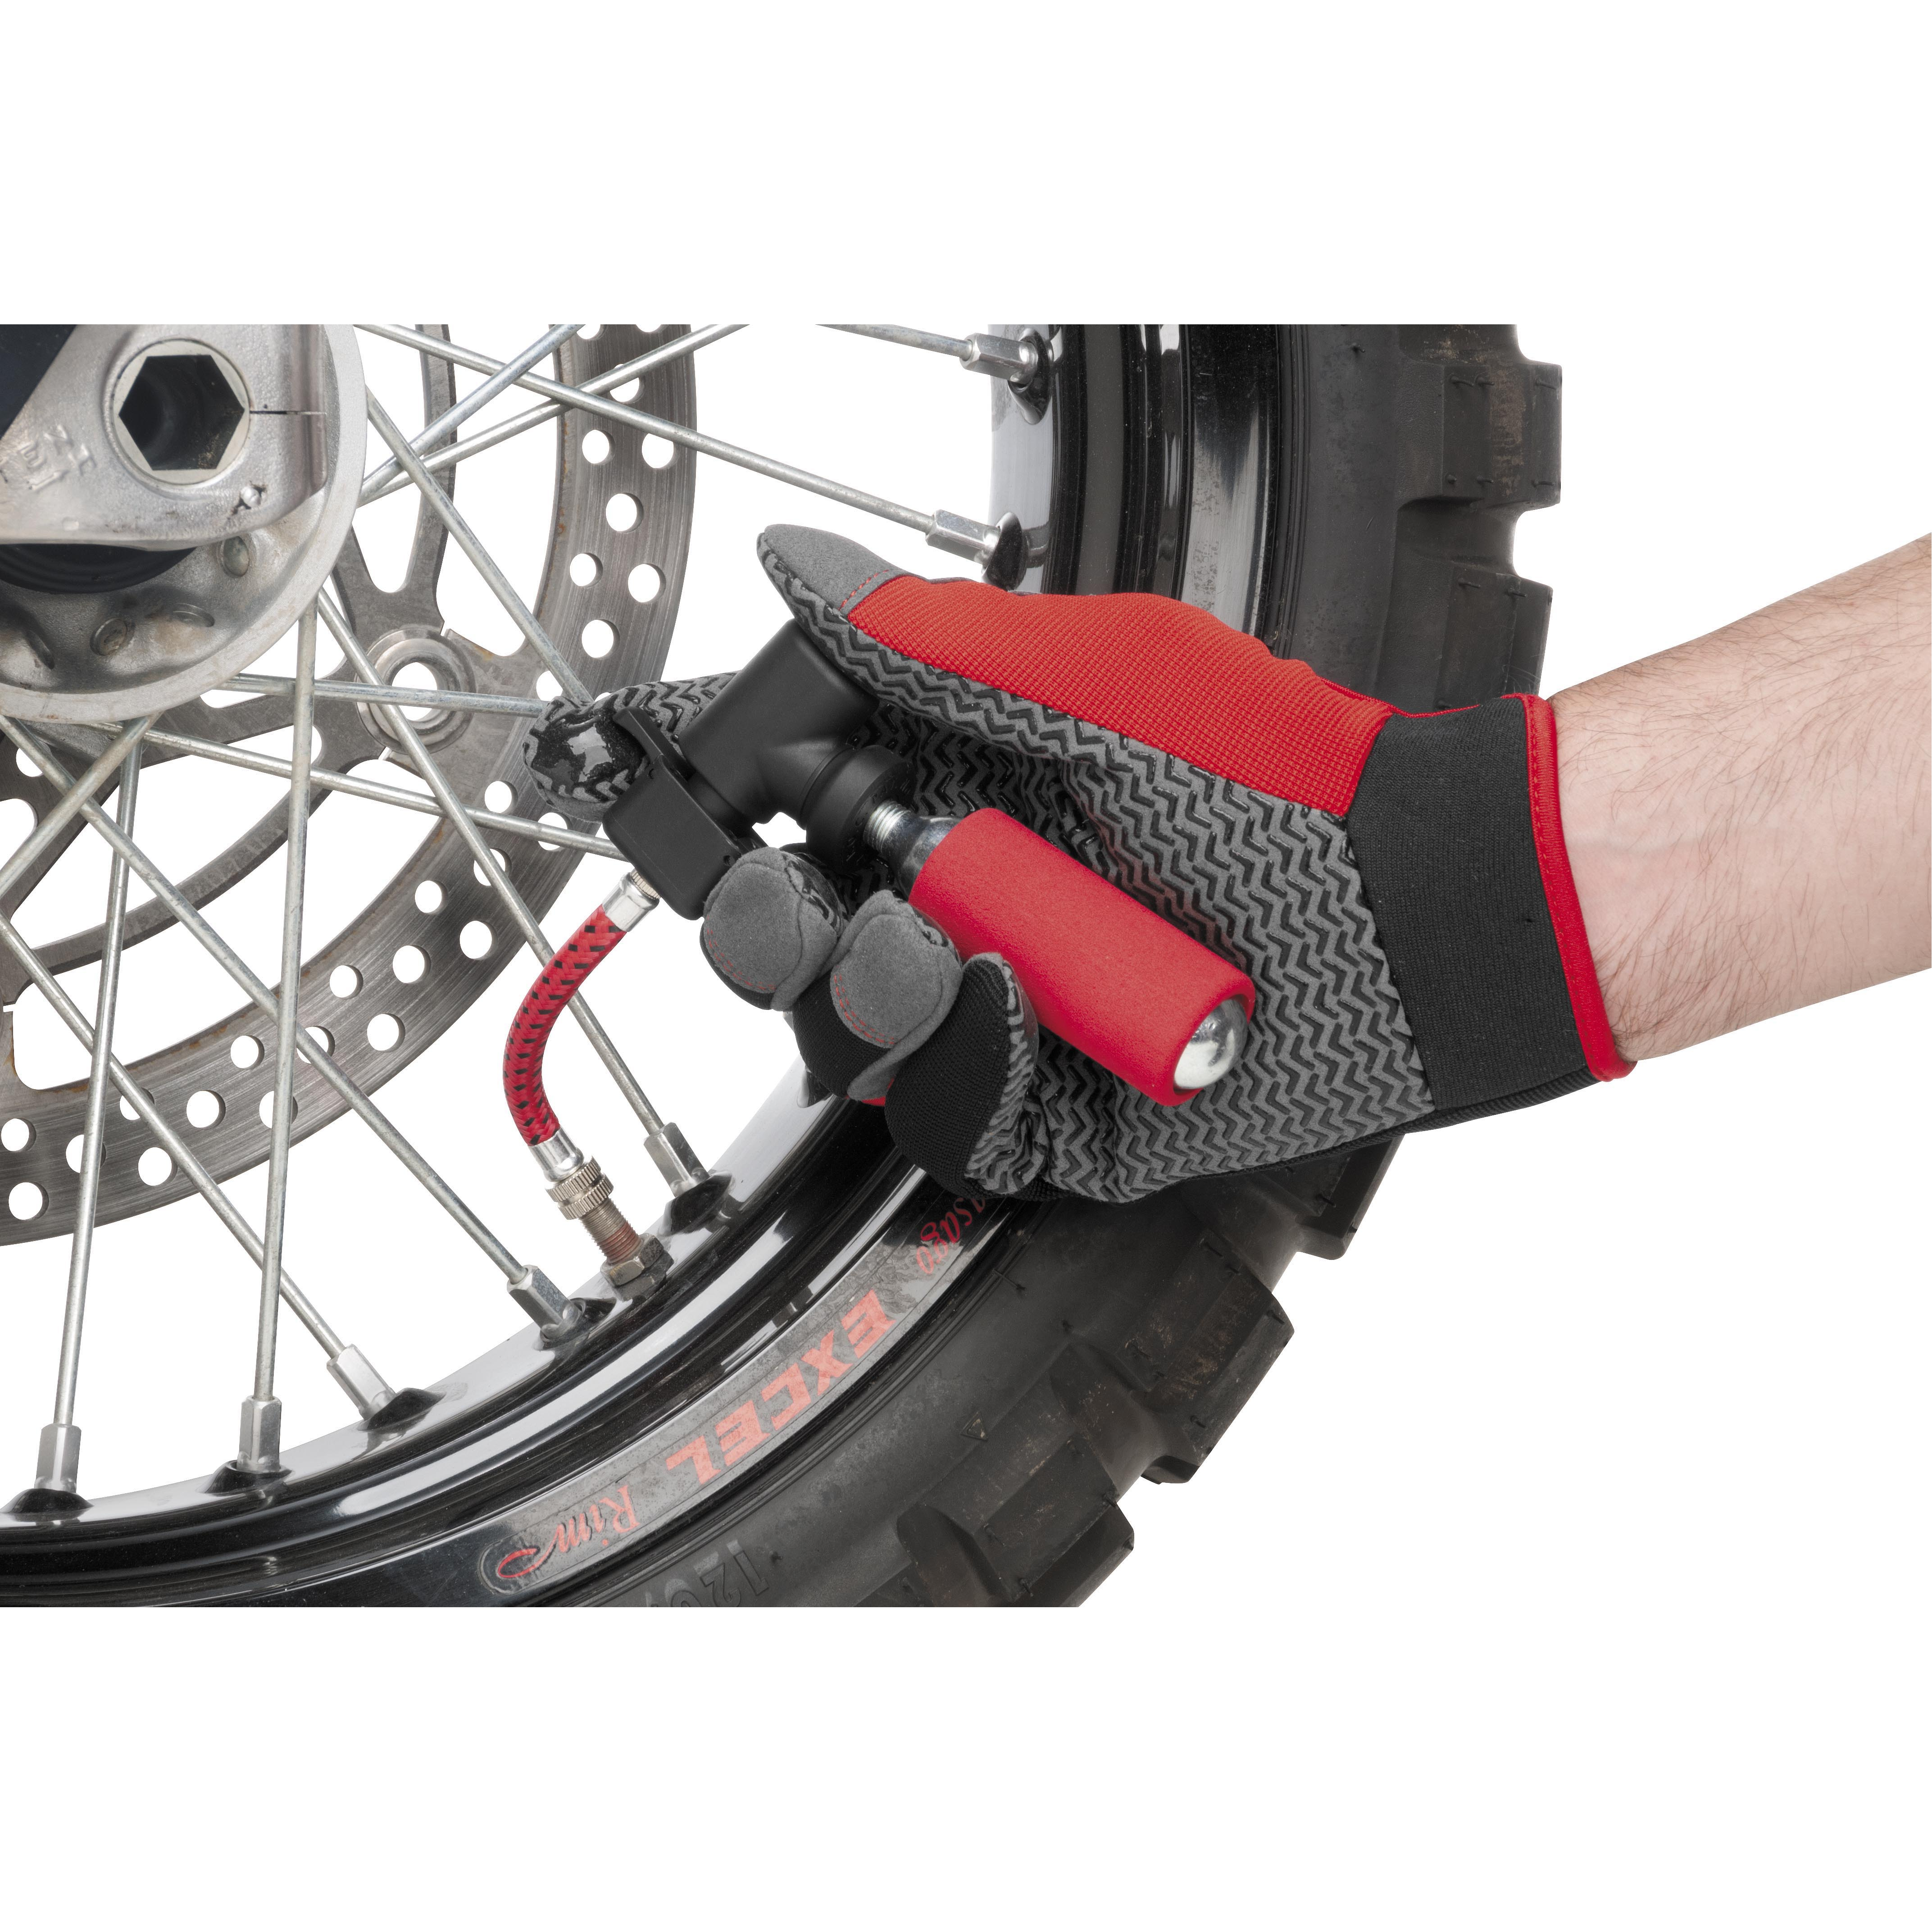 2011-bikemaster-tire-and-tube-flat-repair-kit----635634508741787374